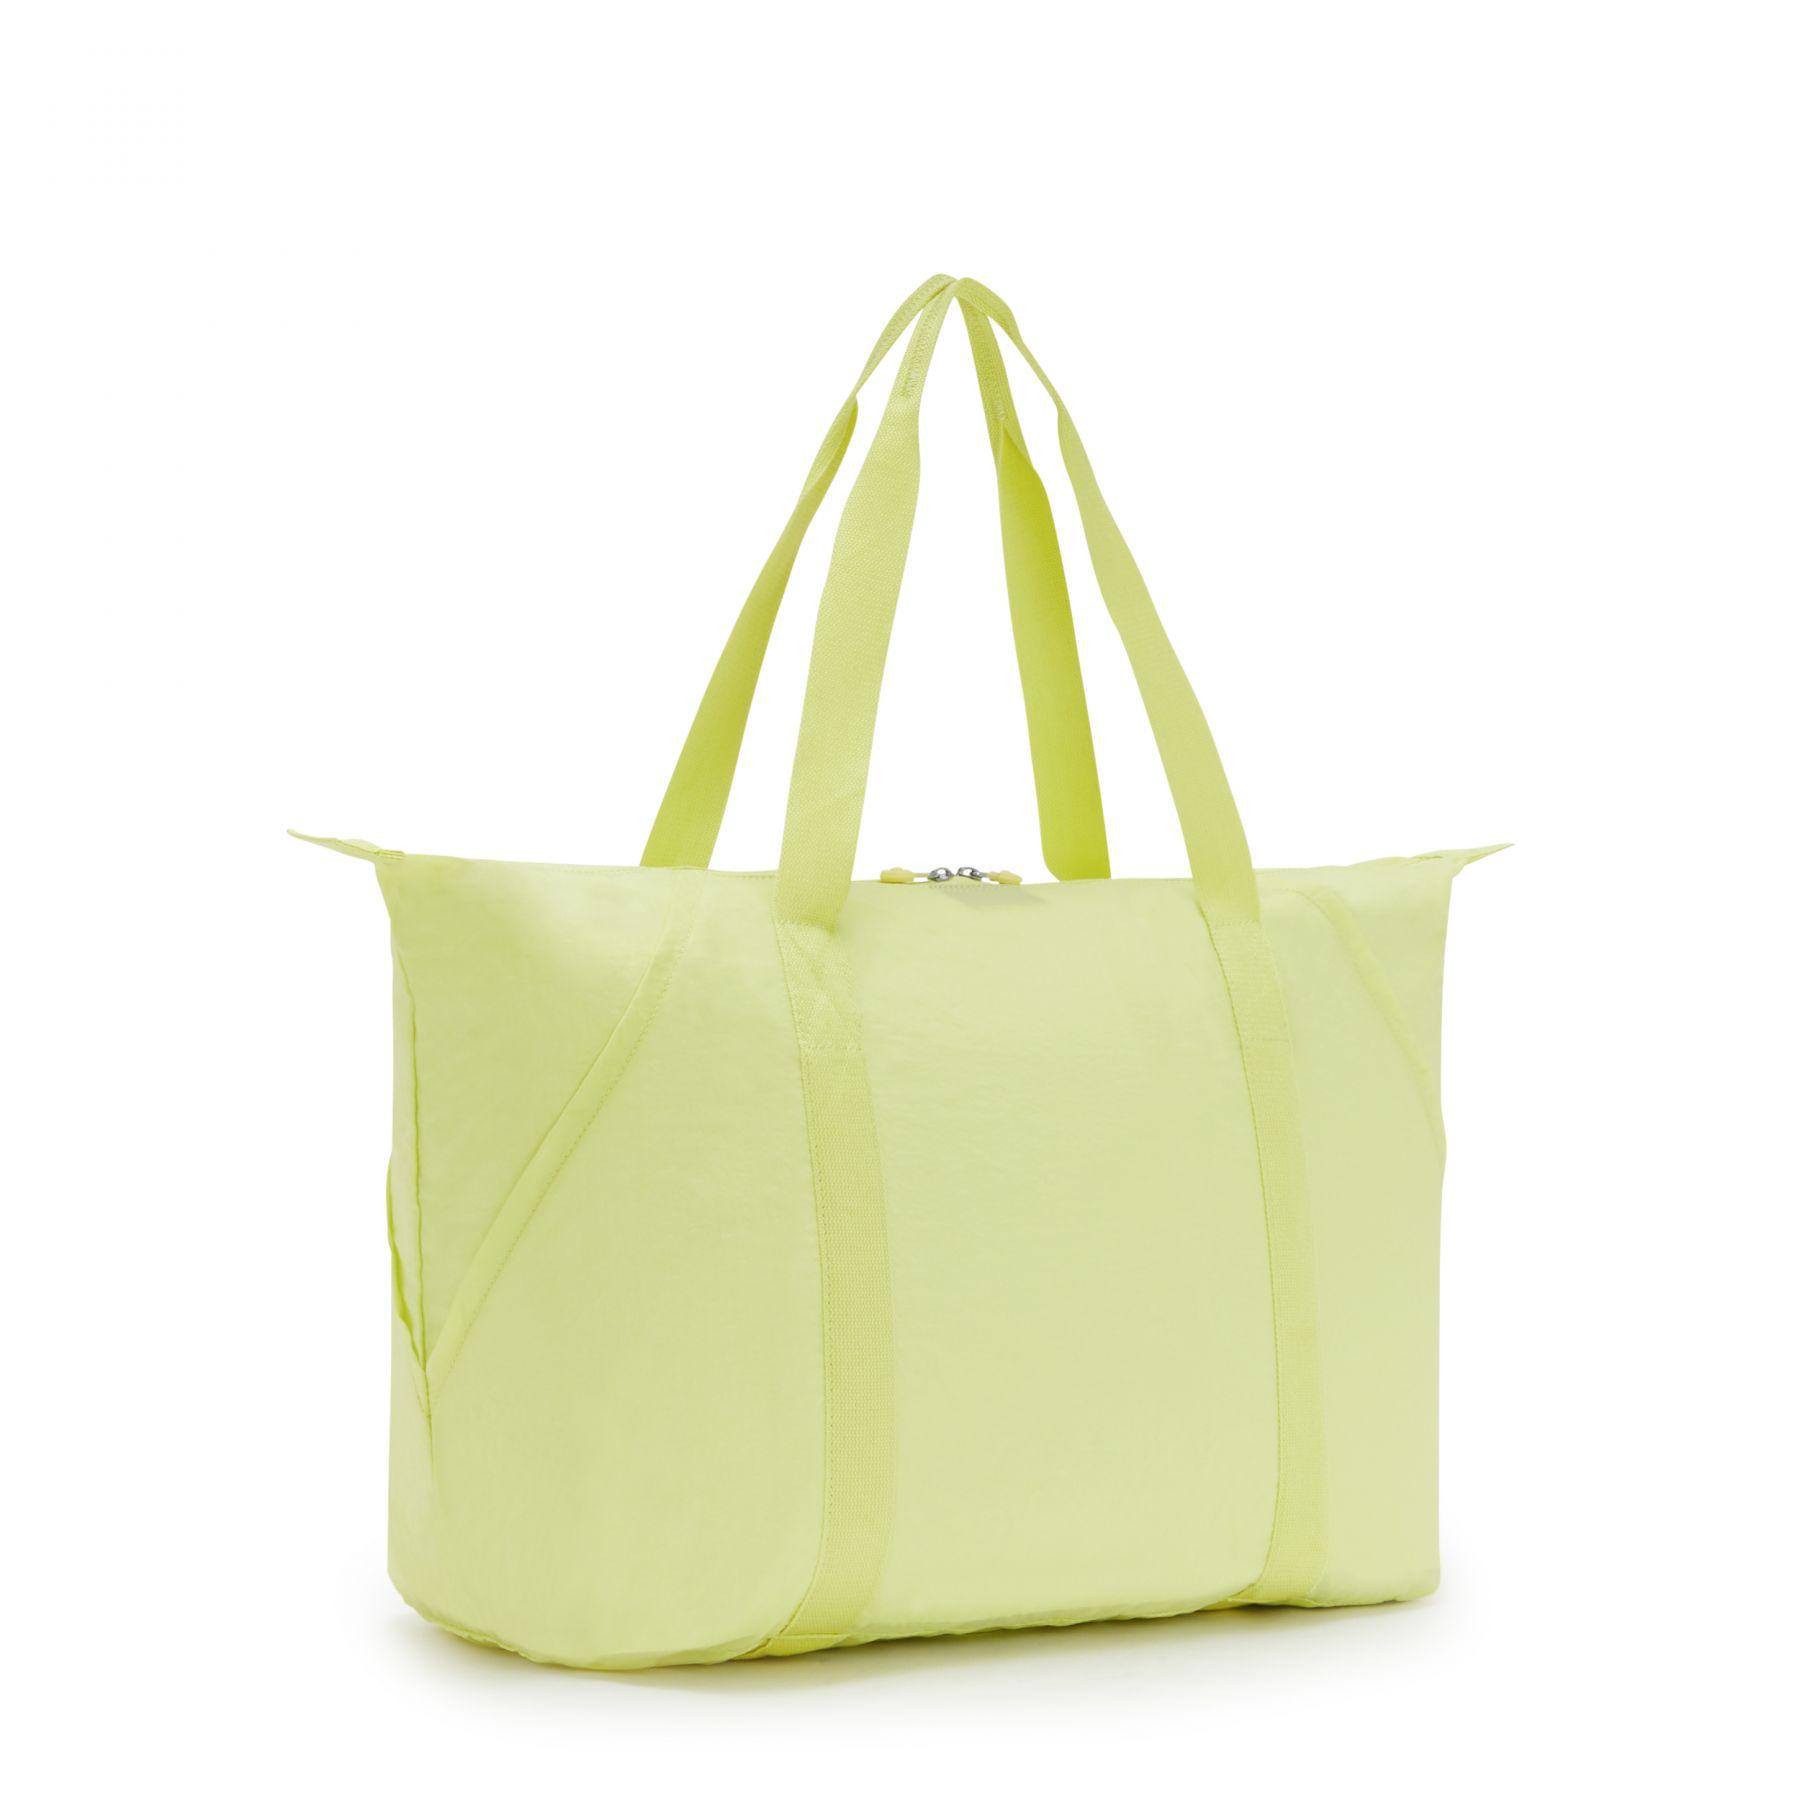 TOTEPACK Lime Green by Kipling